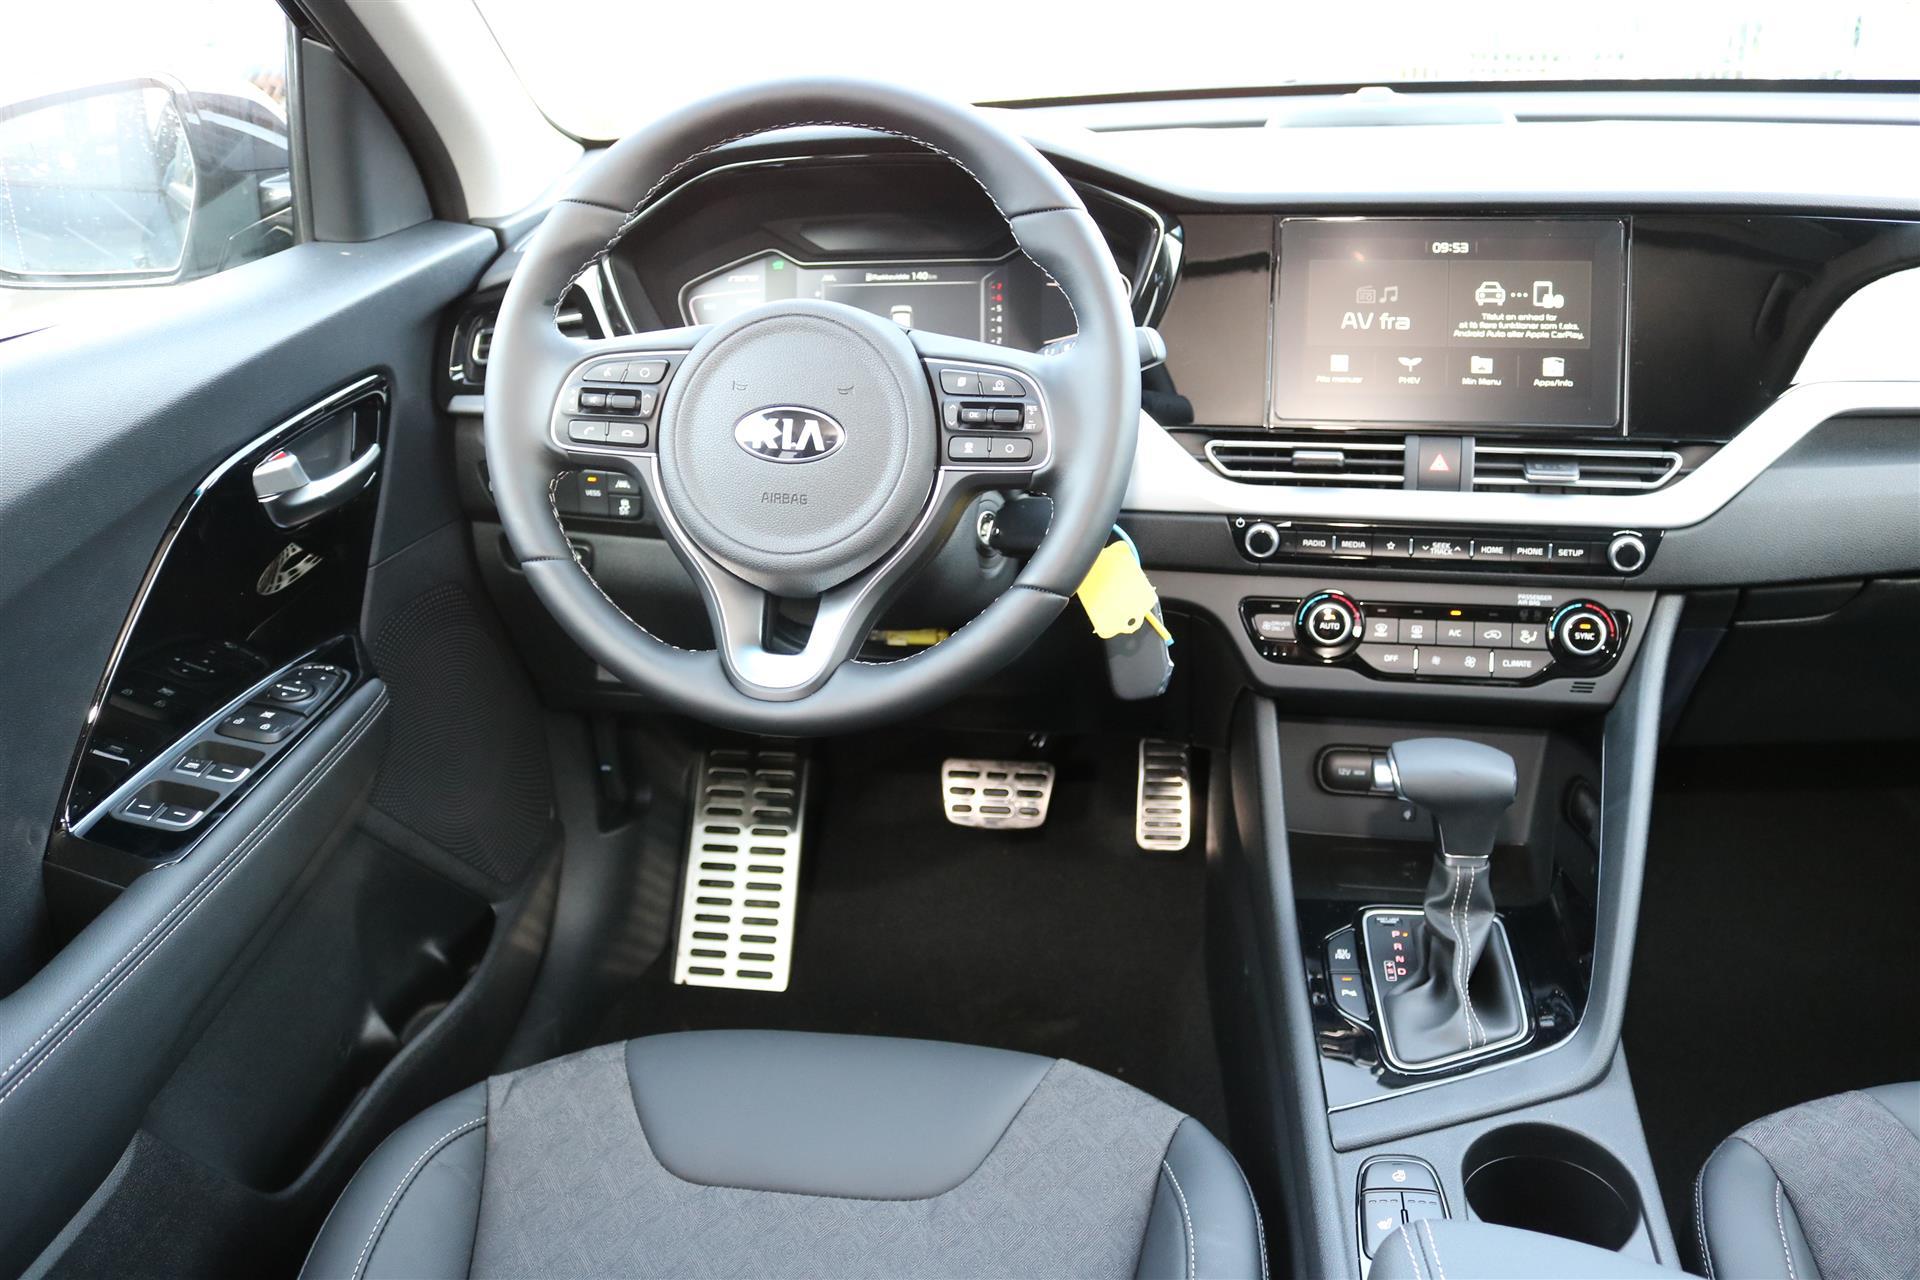 Billede af Kia Niro 1,6 GDI PHEV Comfort DCT 141HK 5d 6g Aut.